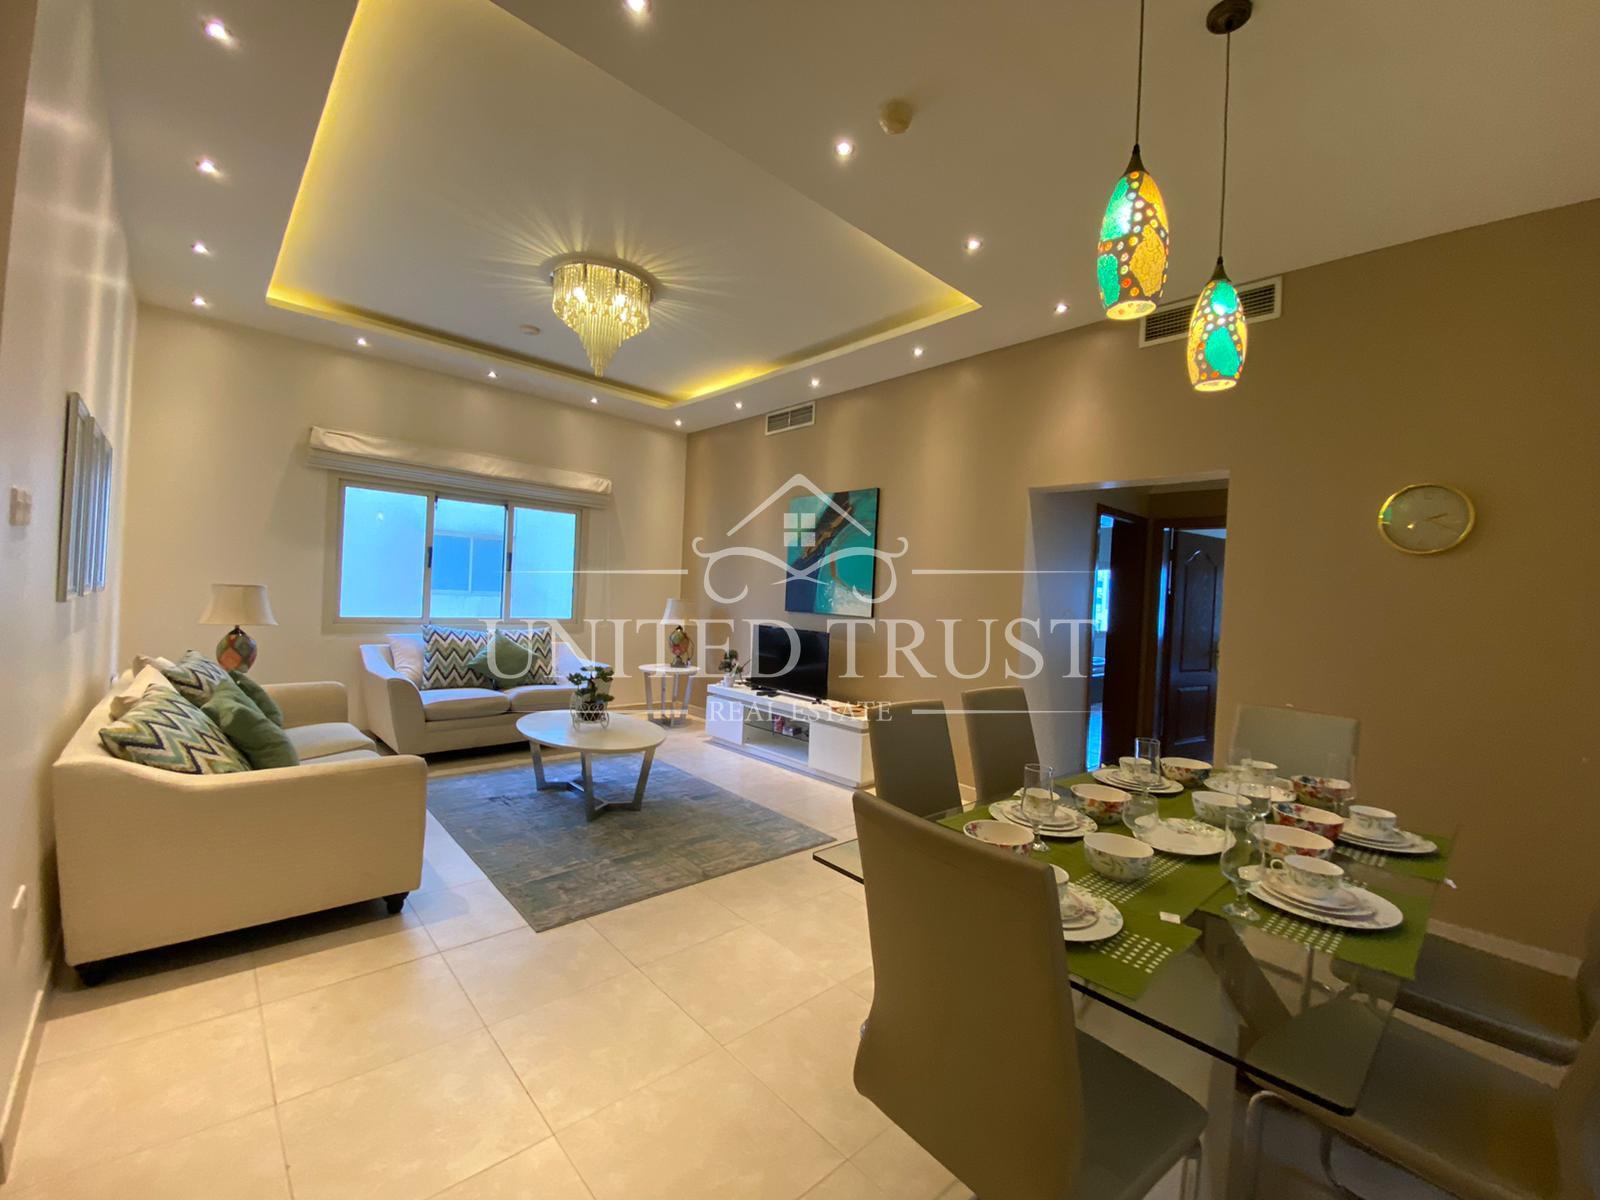 For Rent modern specious flat in Juffair Ref: JUF-MF-035